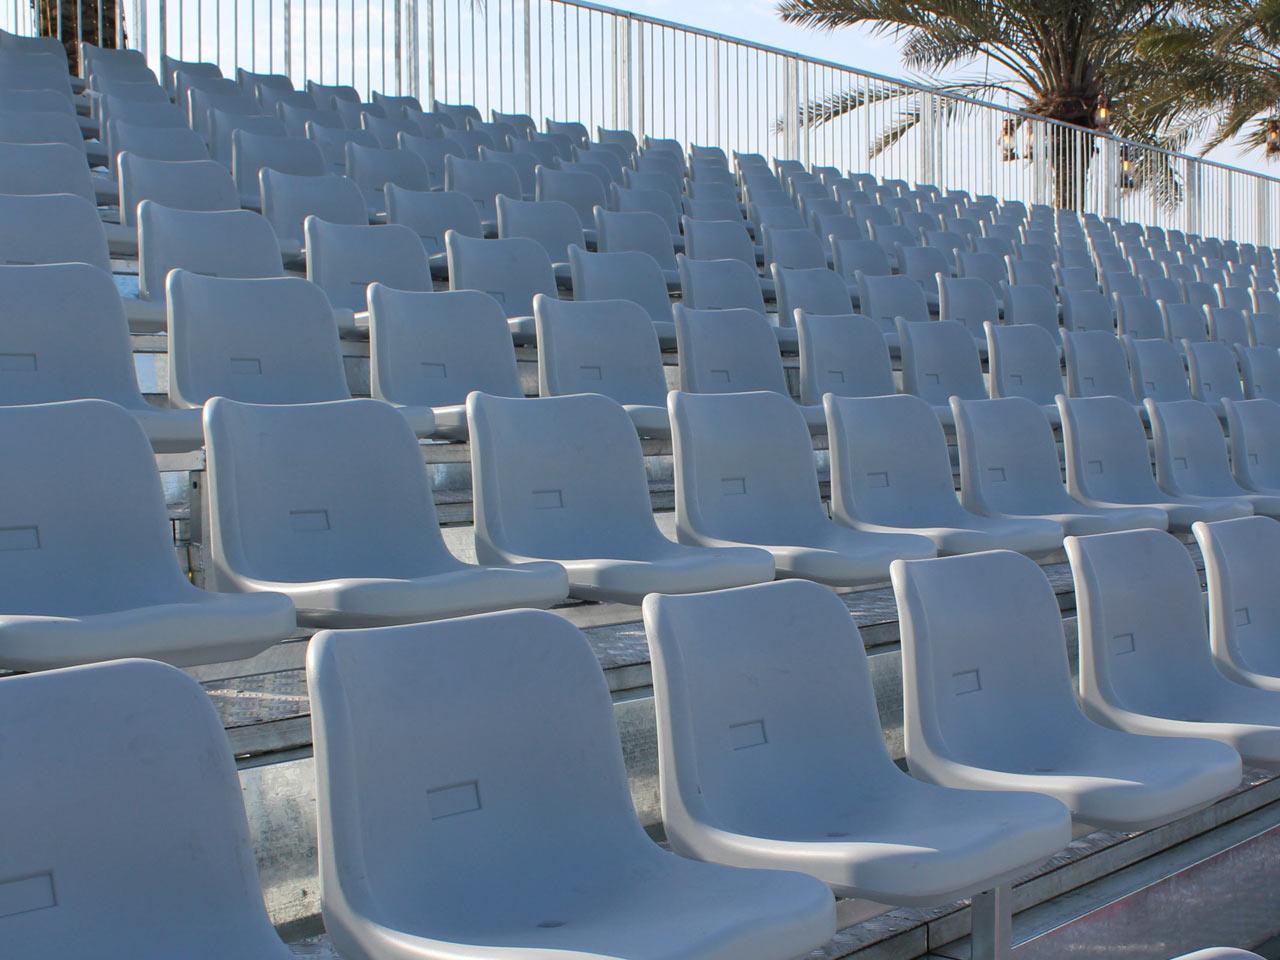 grandstand-seats-events-setup-rental-stadium-seating-sport-management-film-festival-seating-screening-f1-open-air-cinema-7